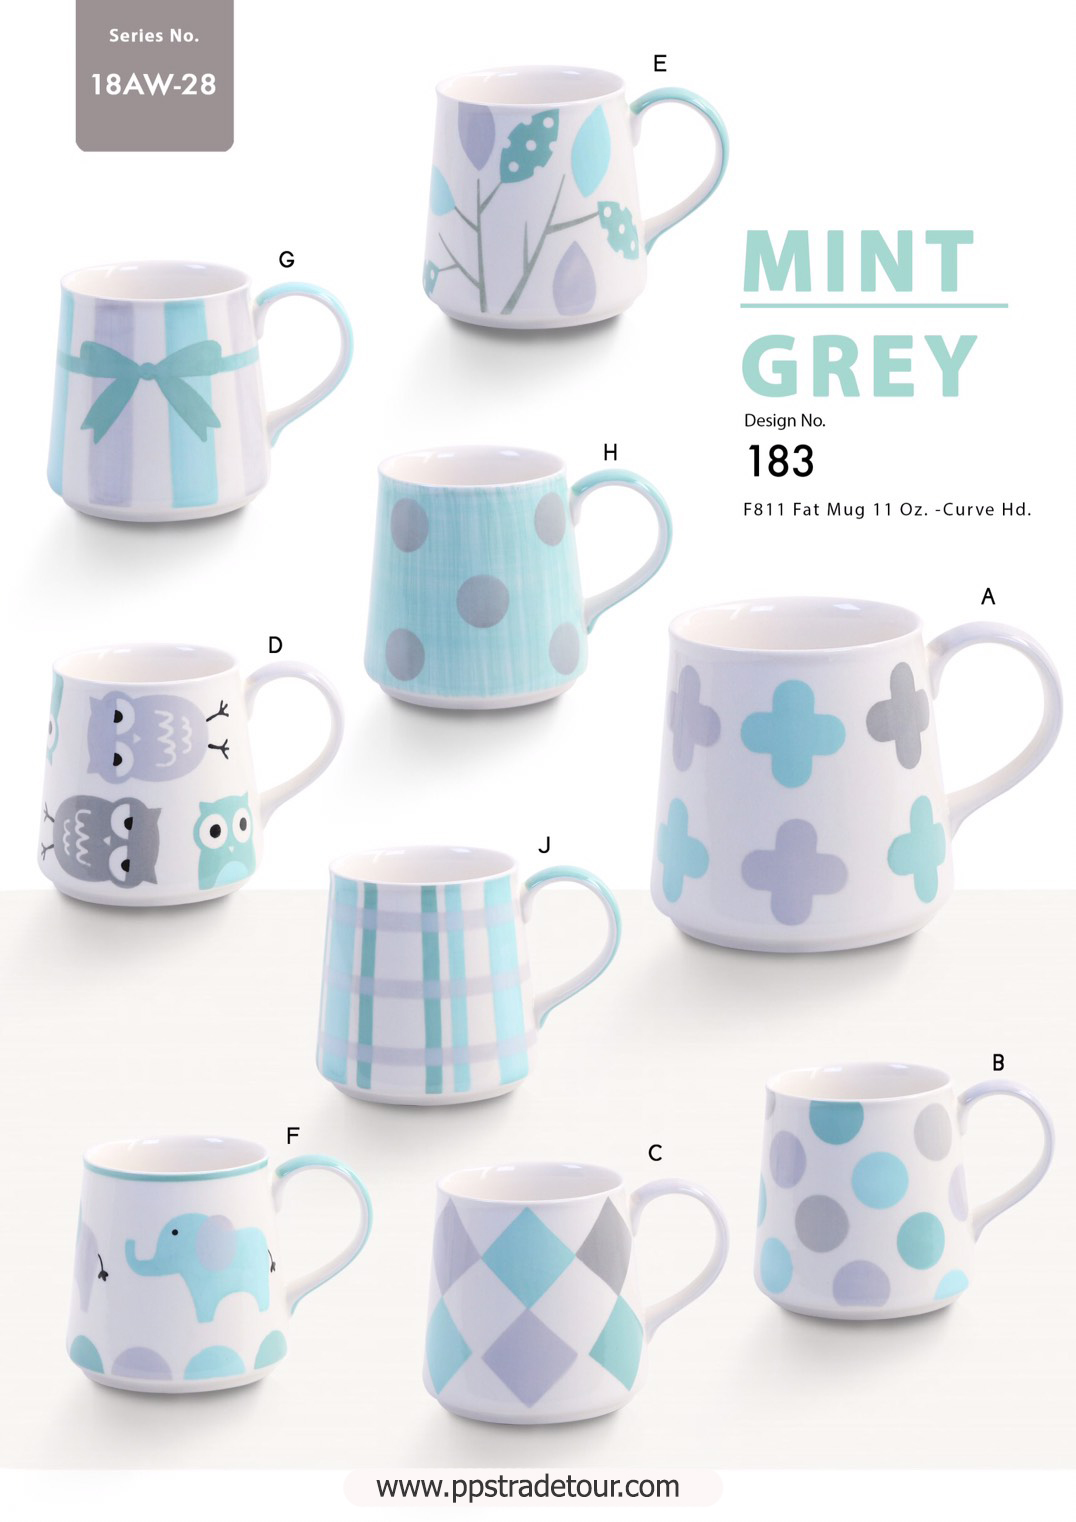 Mint Grey-Ceramic Mug 11 Oz.